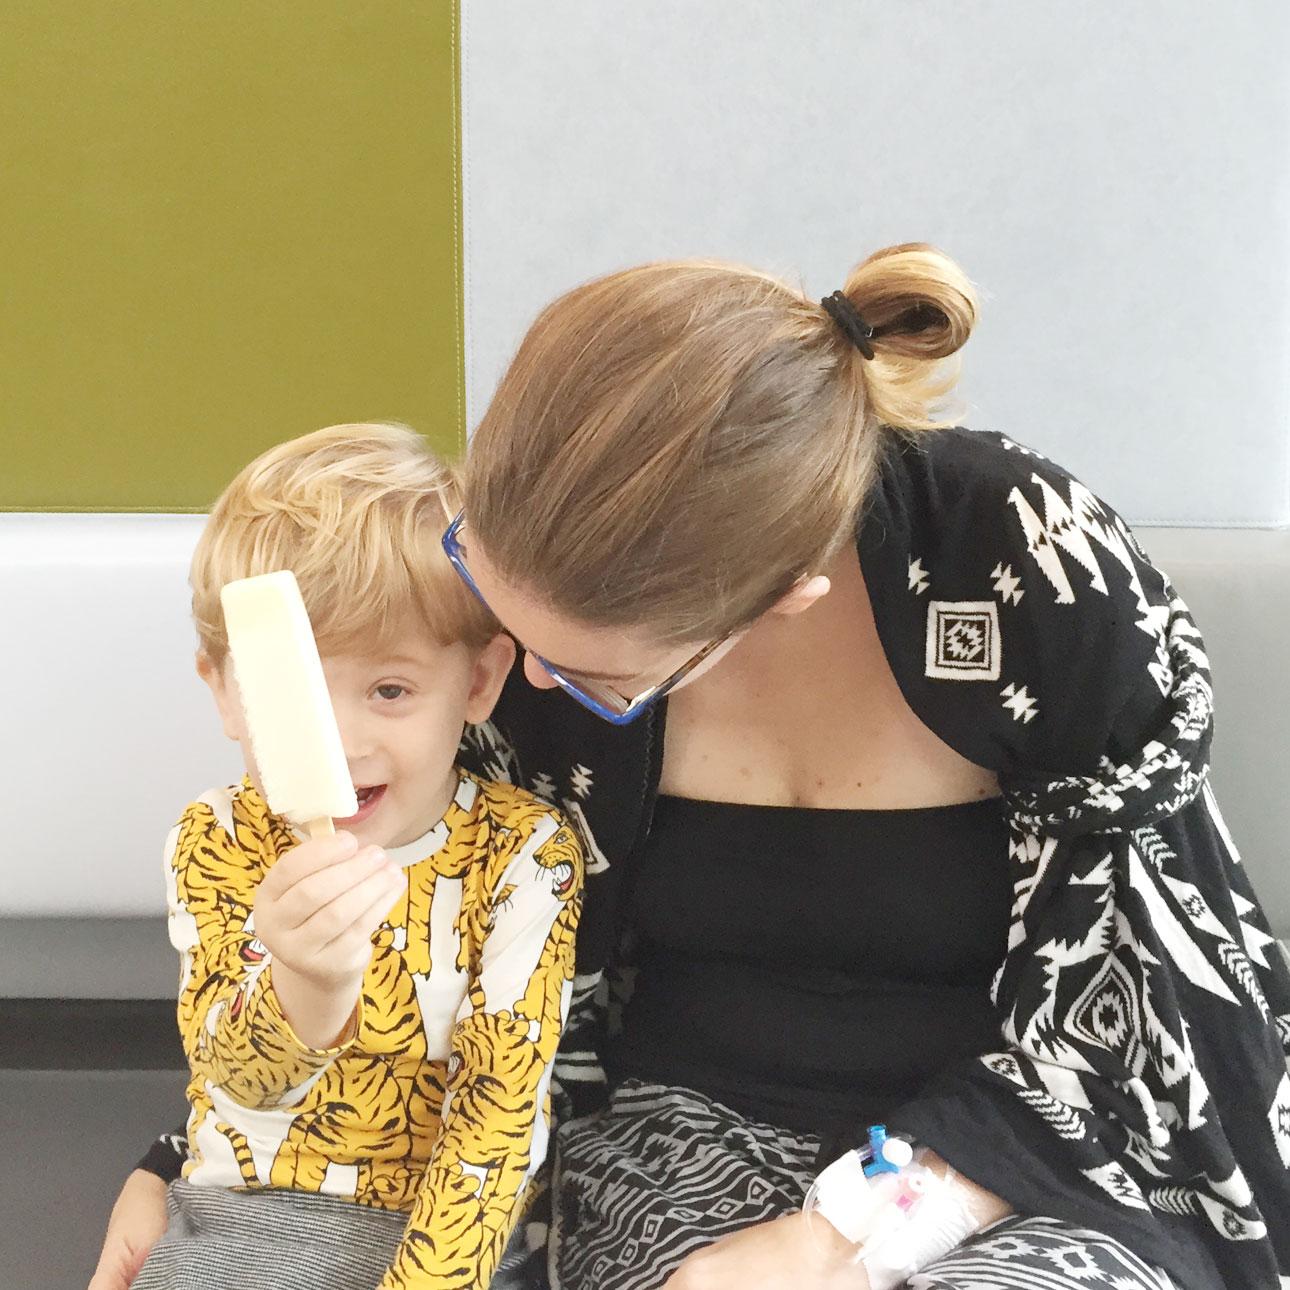 mamalifestyle augustus 2016 ziekenhuisbezoek